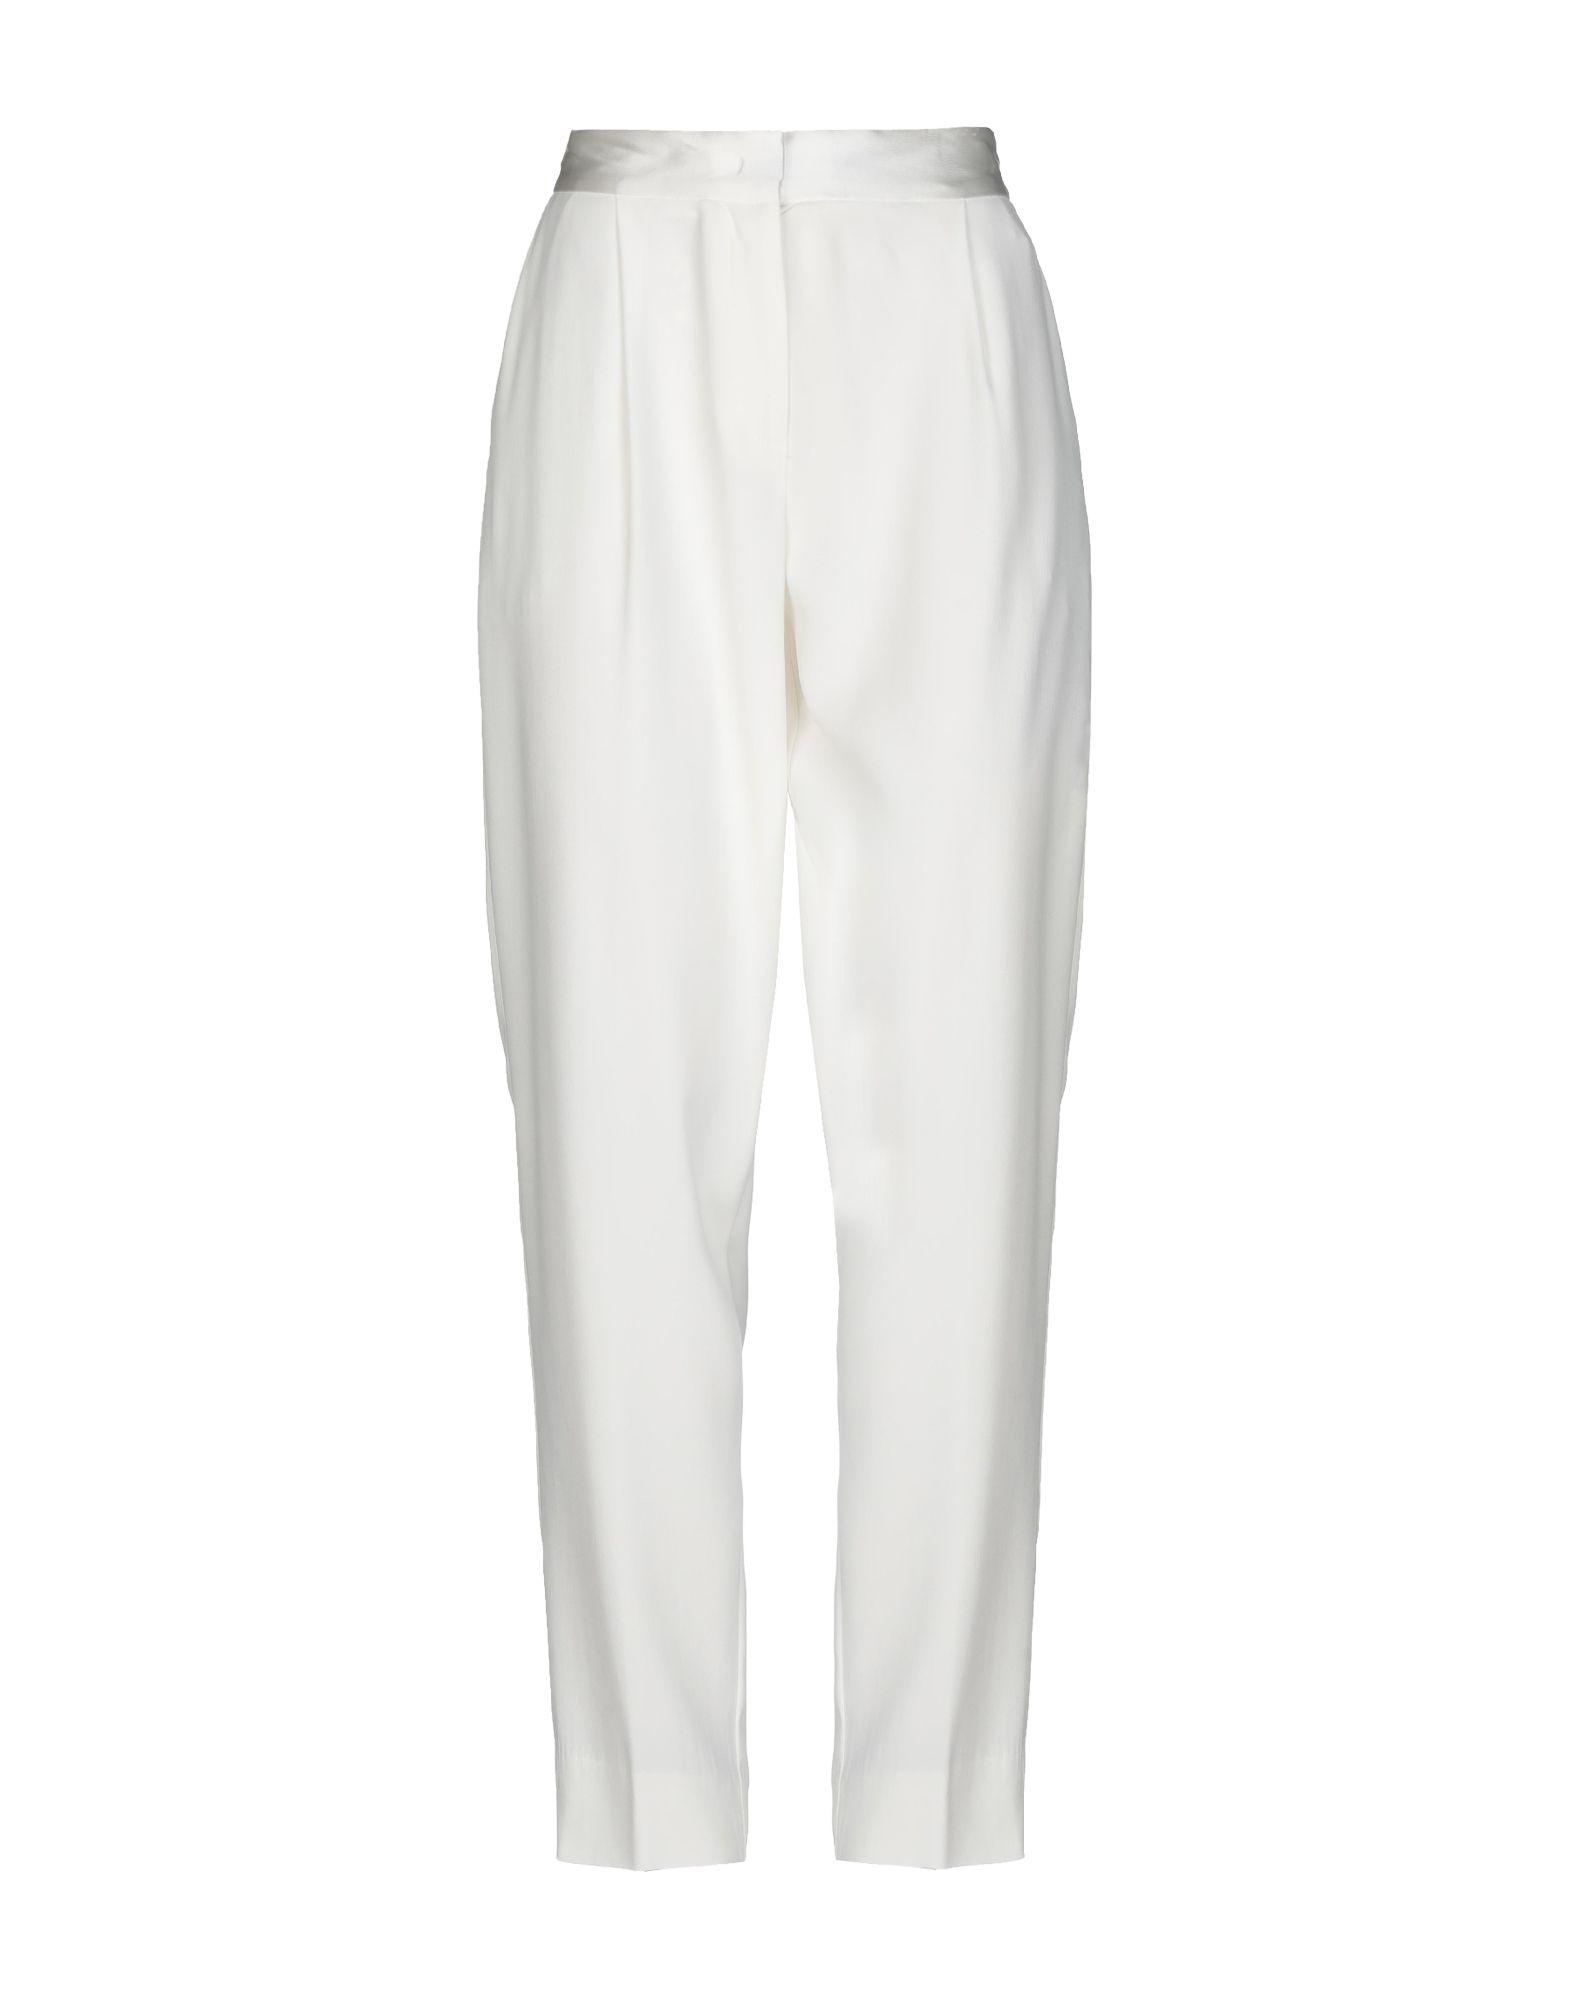 BRIAN DALES | BRIAN DALES Casual Pants 13276668 | Goxip